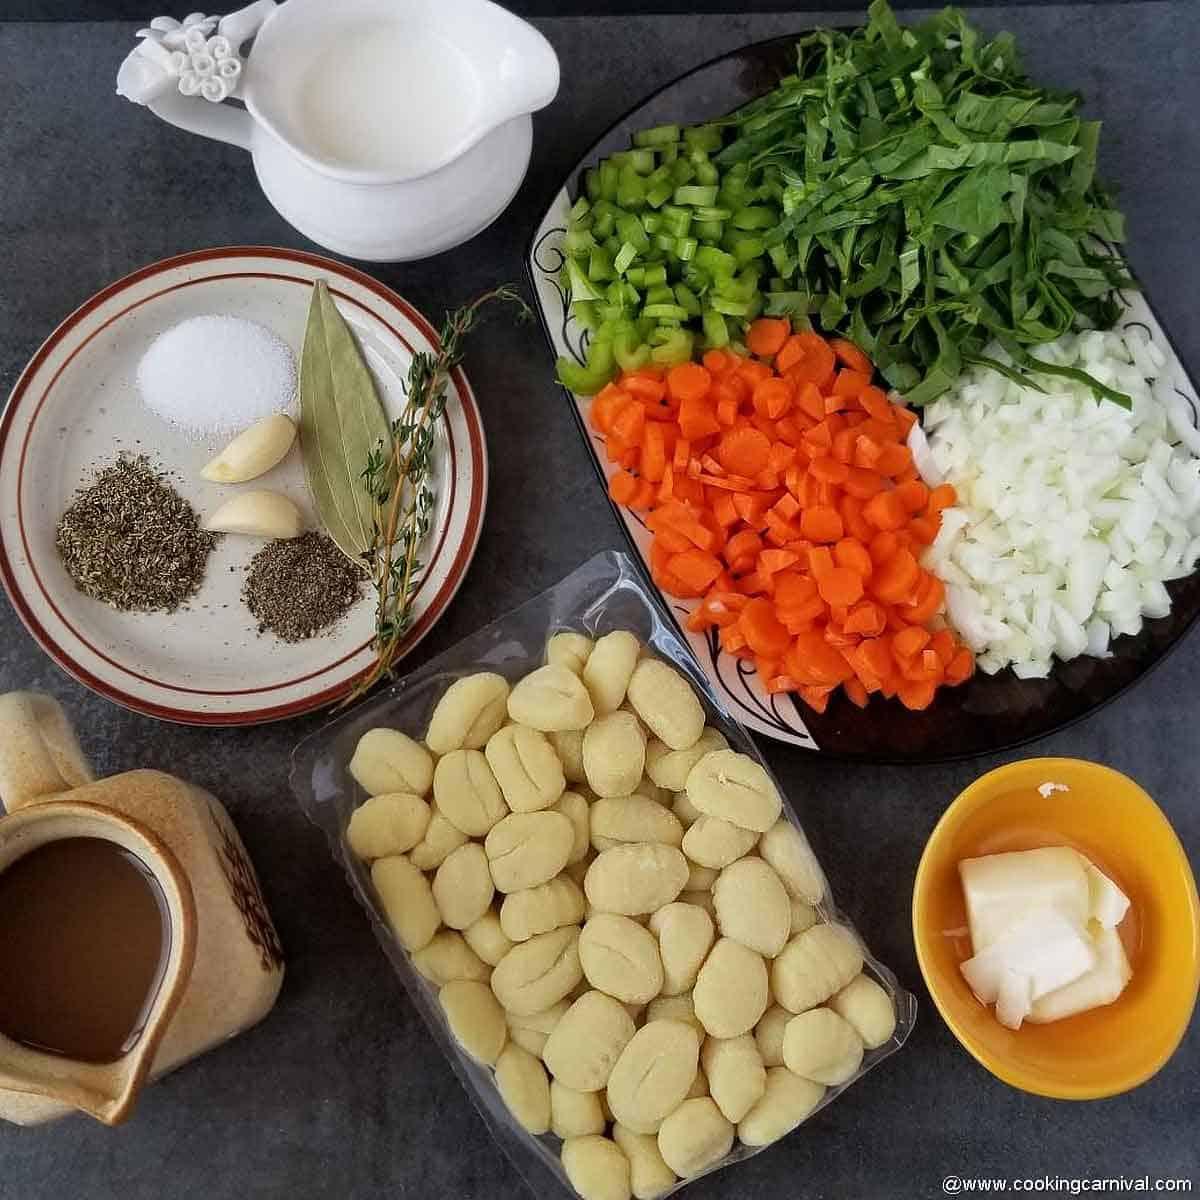 pre-measured ingredients of instant pot gnocchi soup on black backdrop